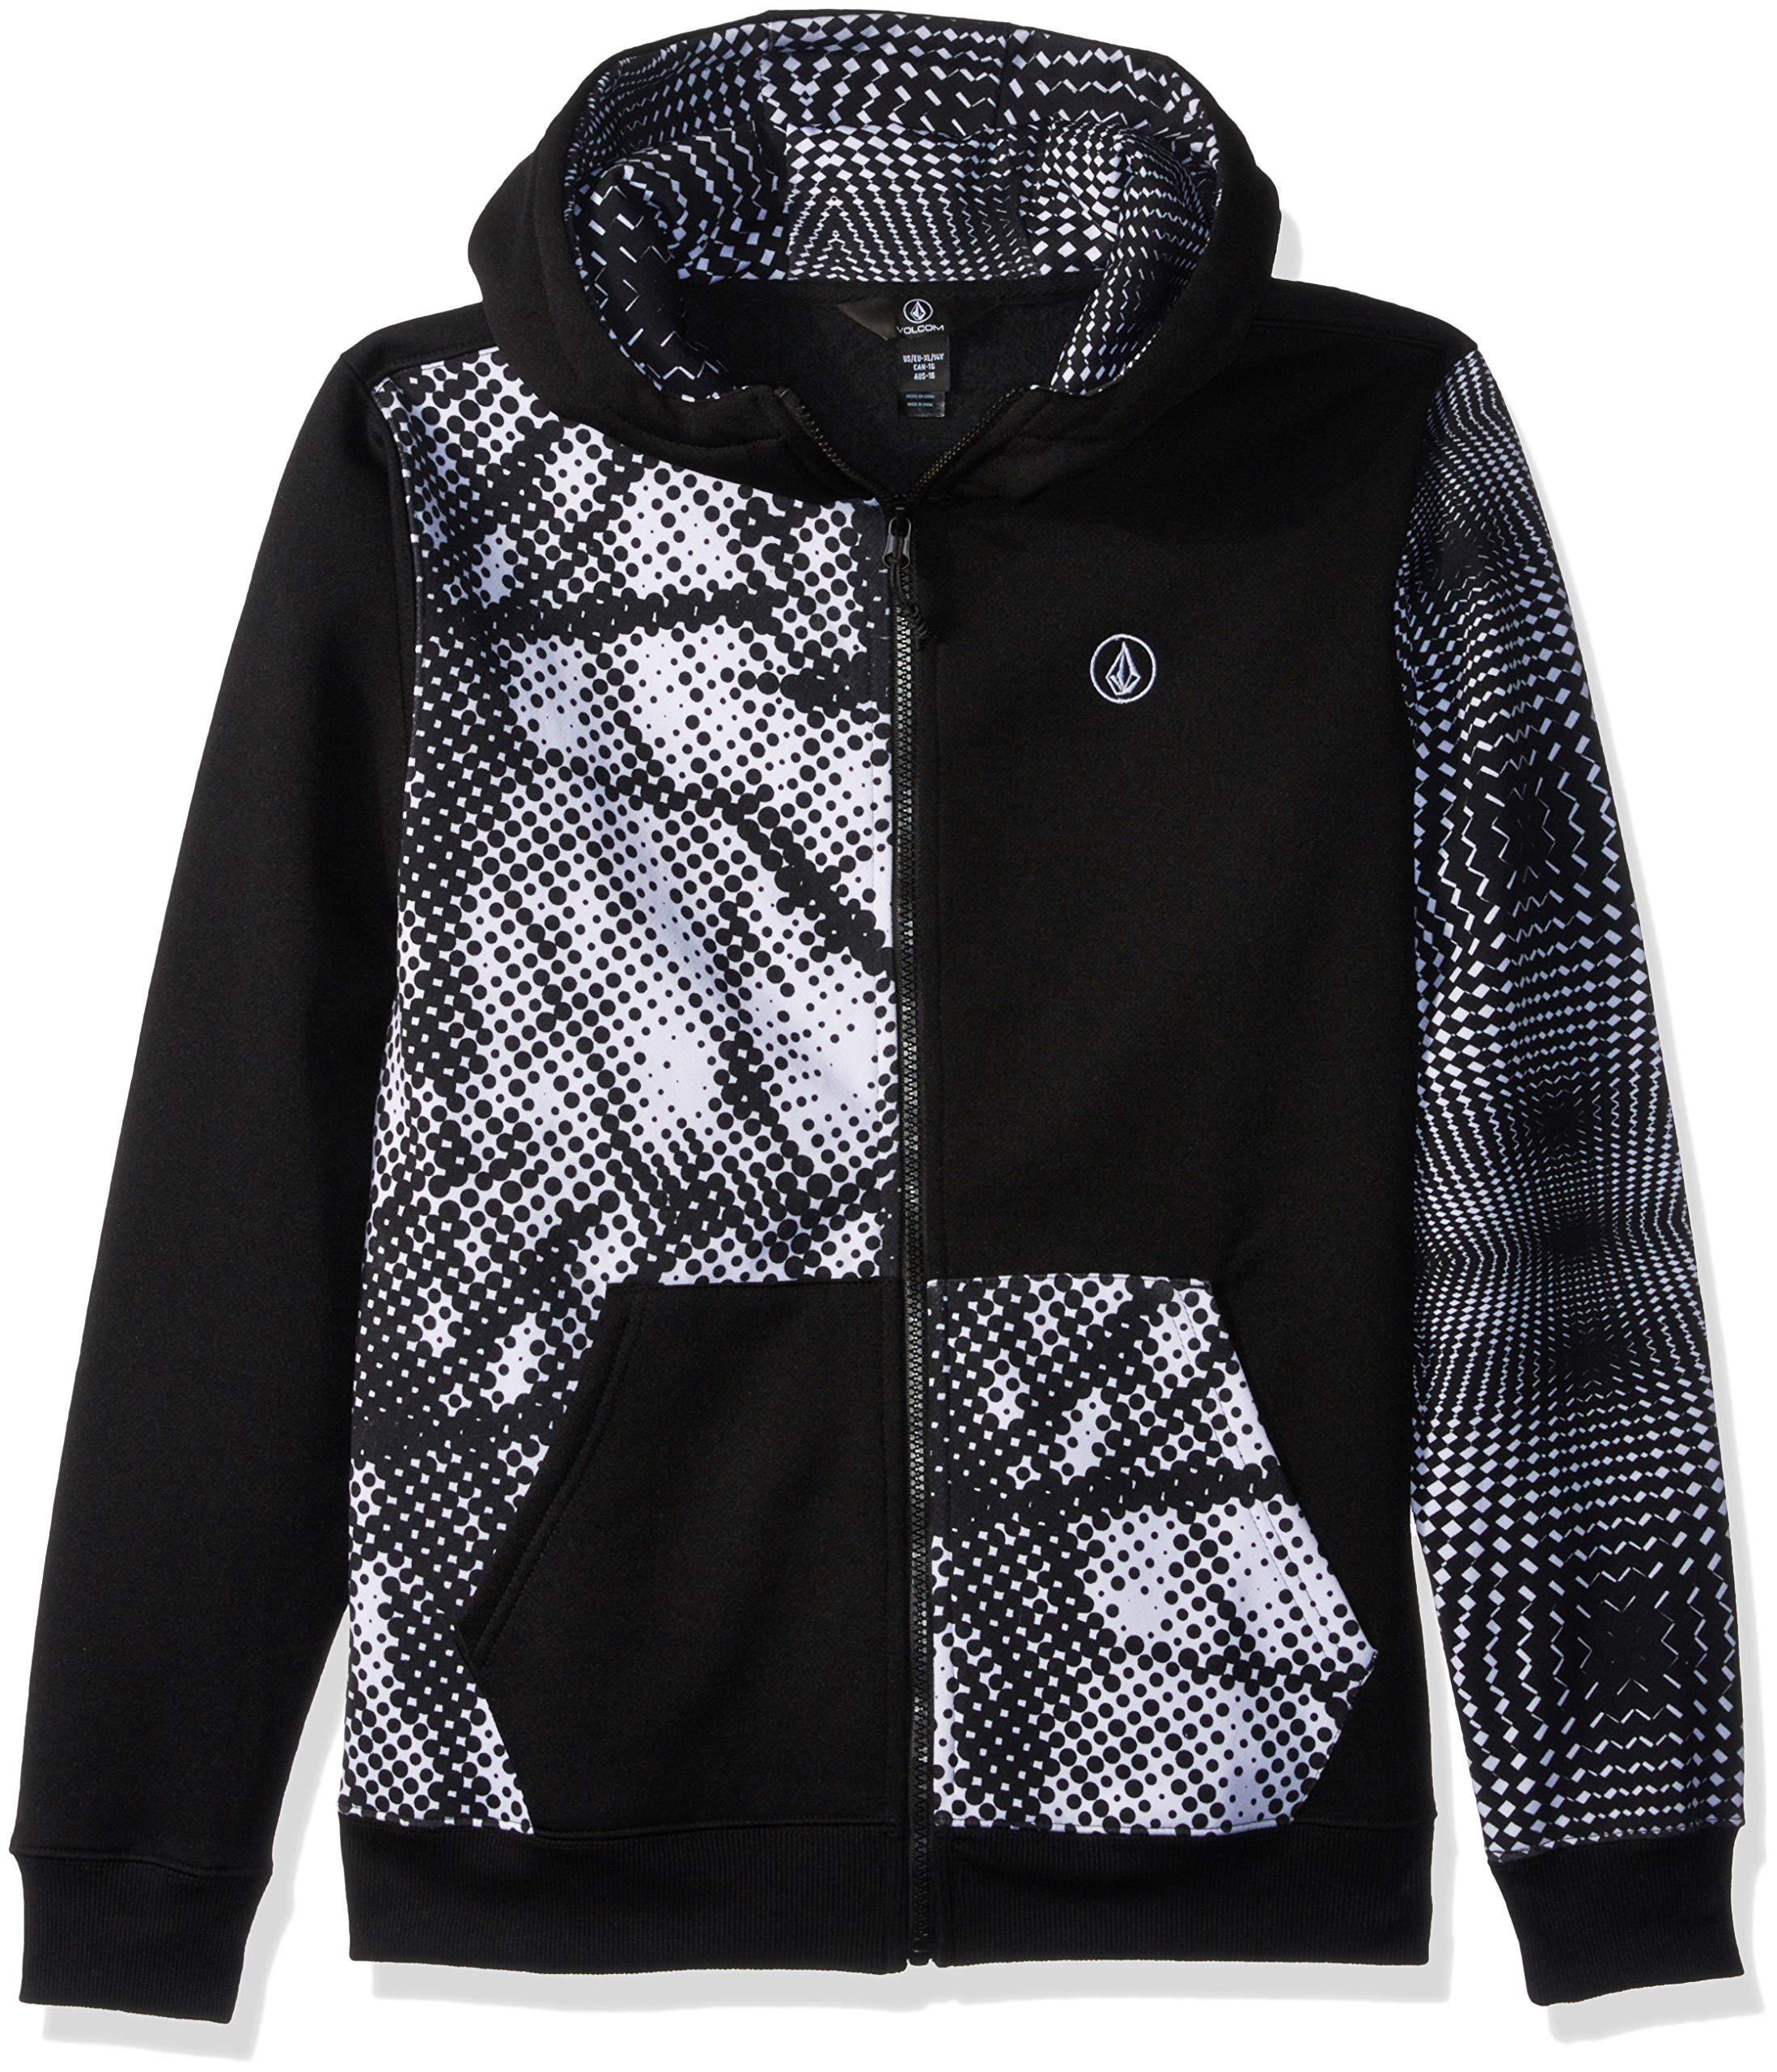 Volcom Boys' Big Grohman 280g Hydrophobic Hooded Fleece Sweatshirt, Black/White, Extra Large